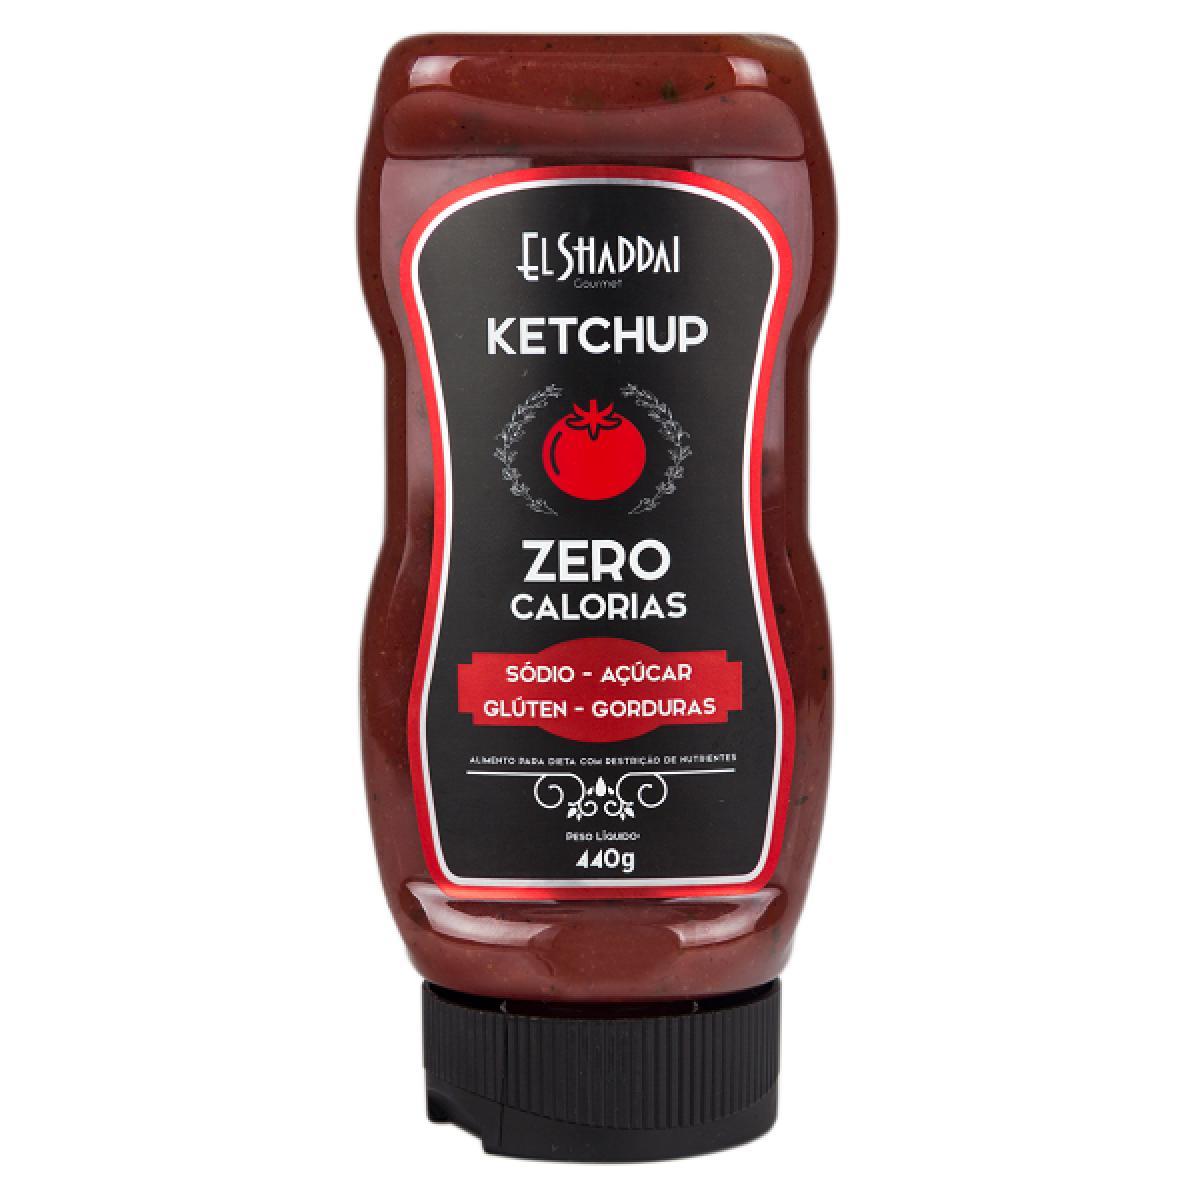 Ketchup Zero Calorias 440g El Shaddai - Clube do Fit